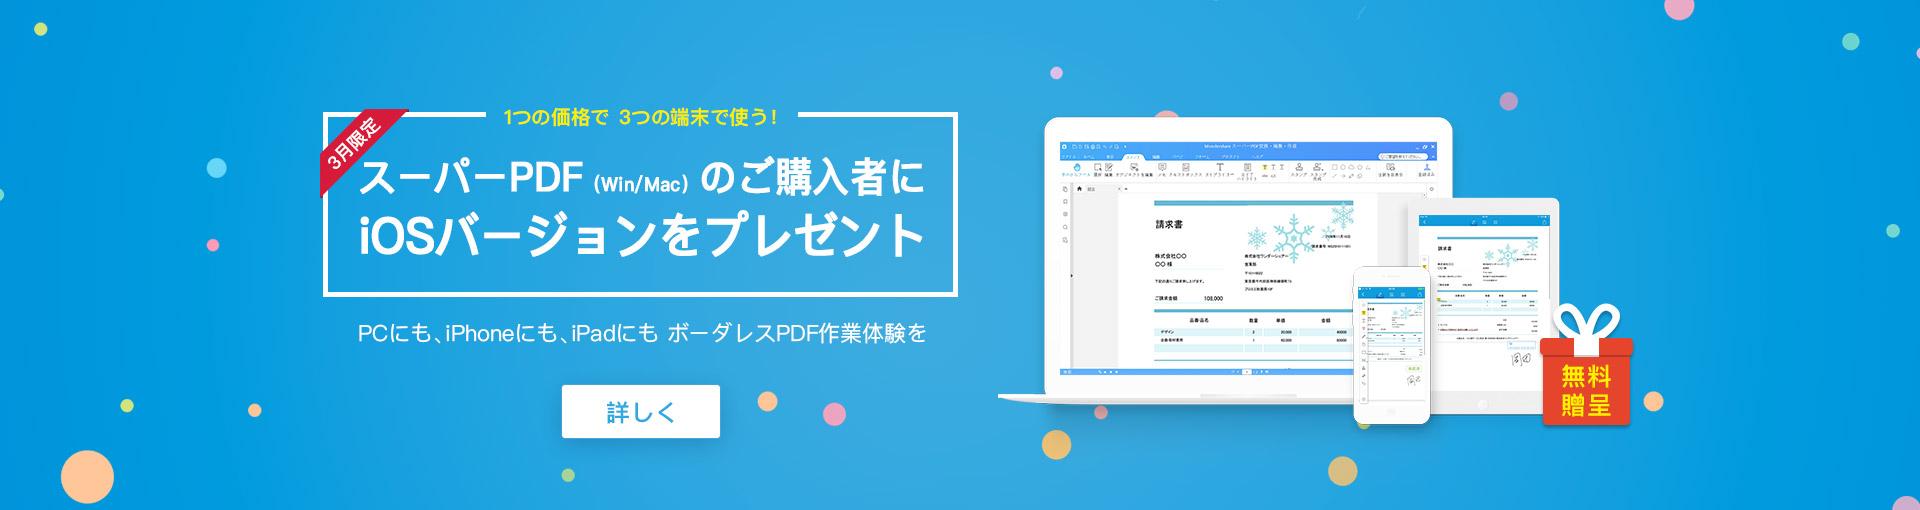 ios版PDF無料贈呈